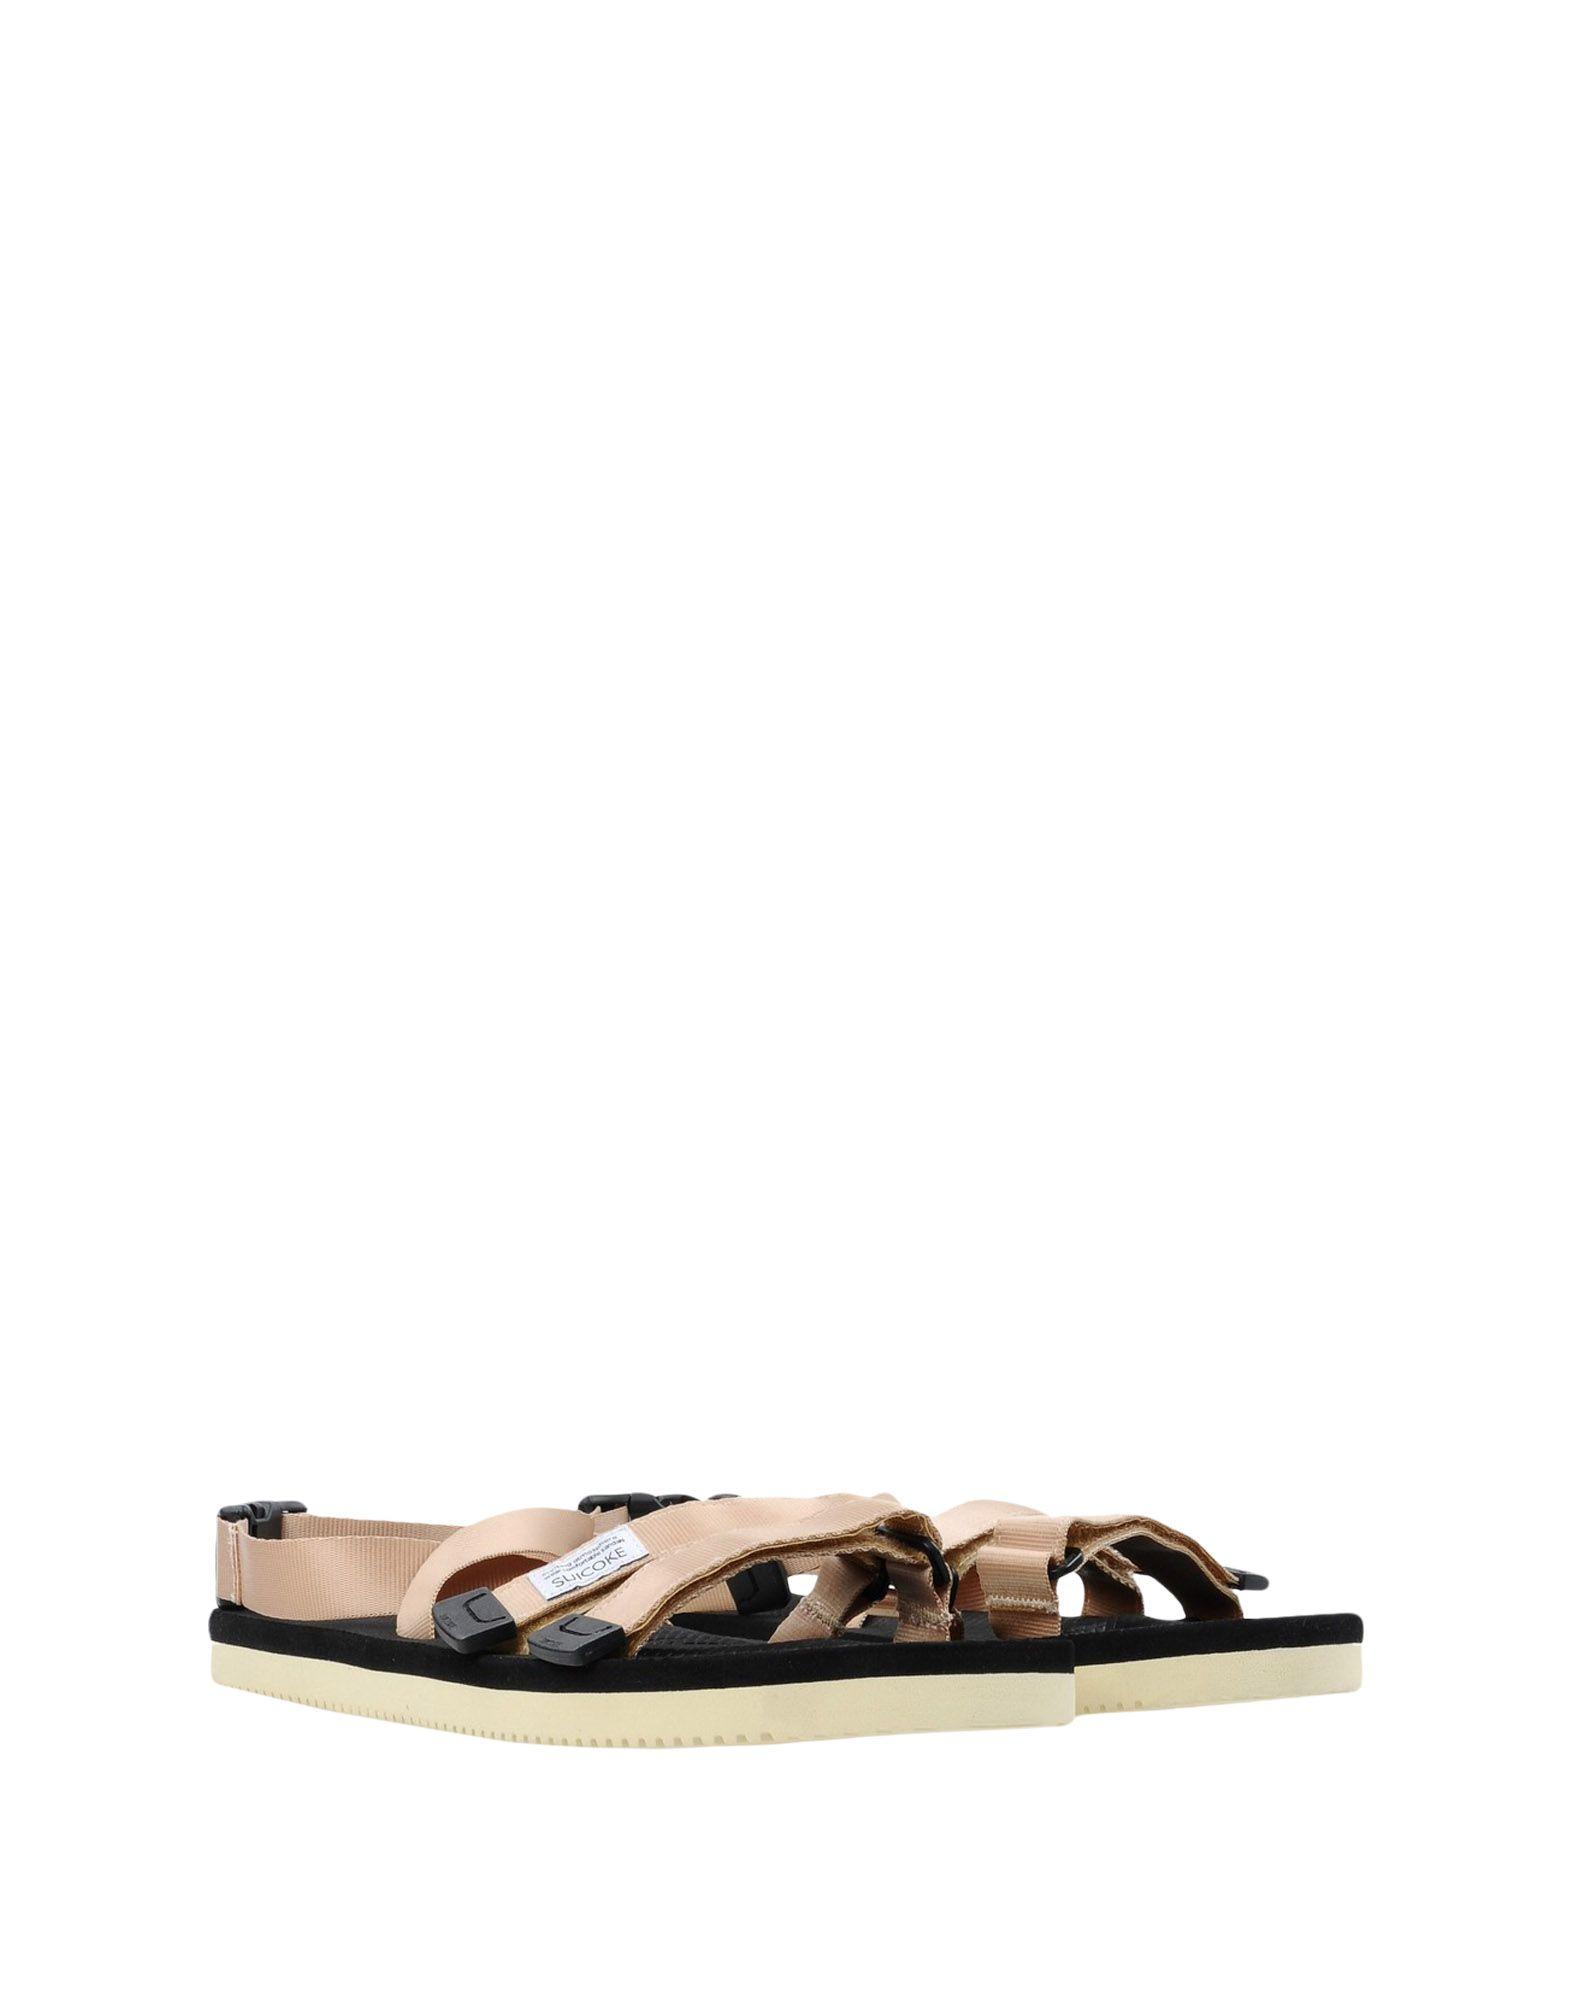 Suicoke Sandalen Damen  11273062MS Gute Qualität beliebte Schuhe